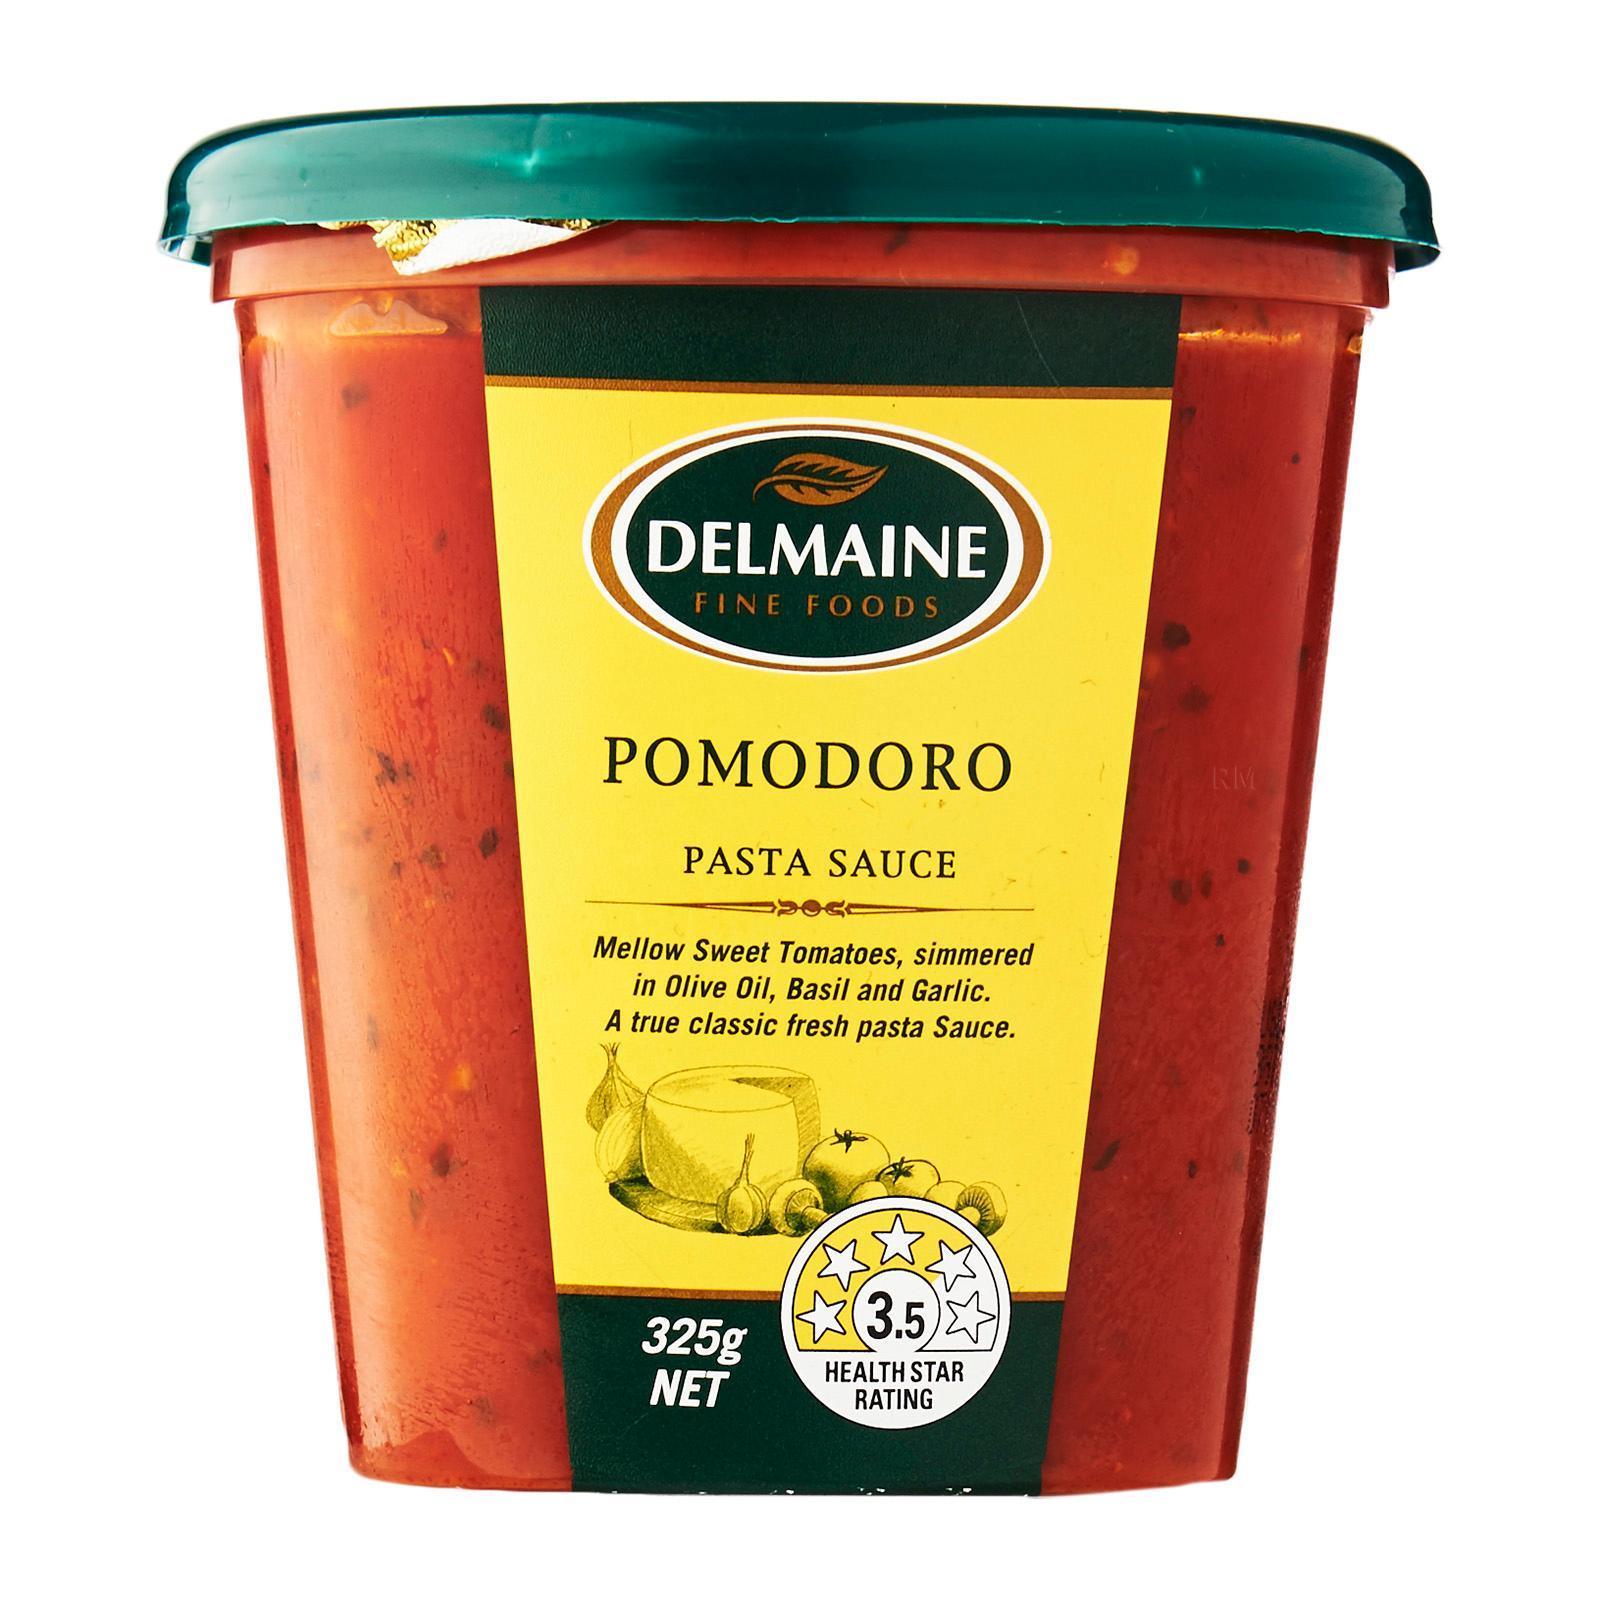 Delmaine Pomodoro Fresh Pasta Sauce By Redmart.